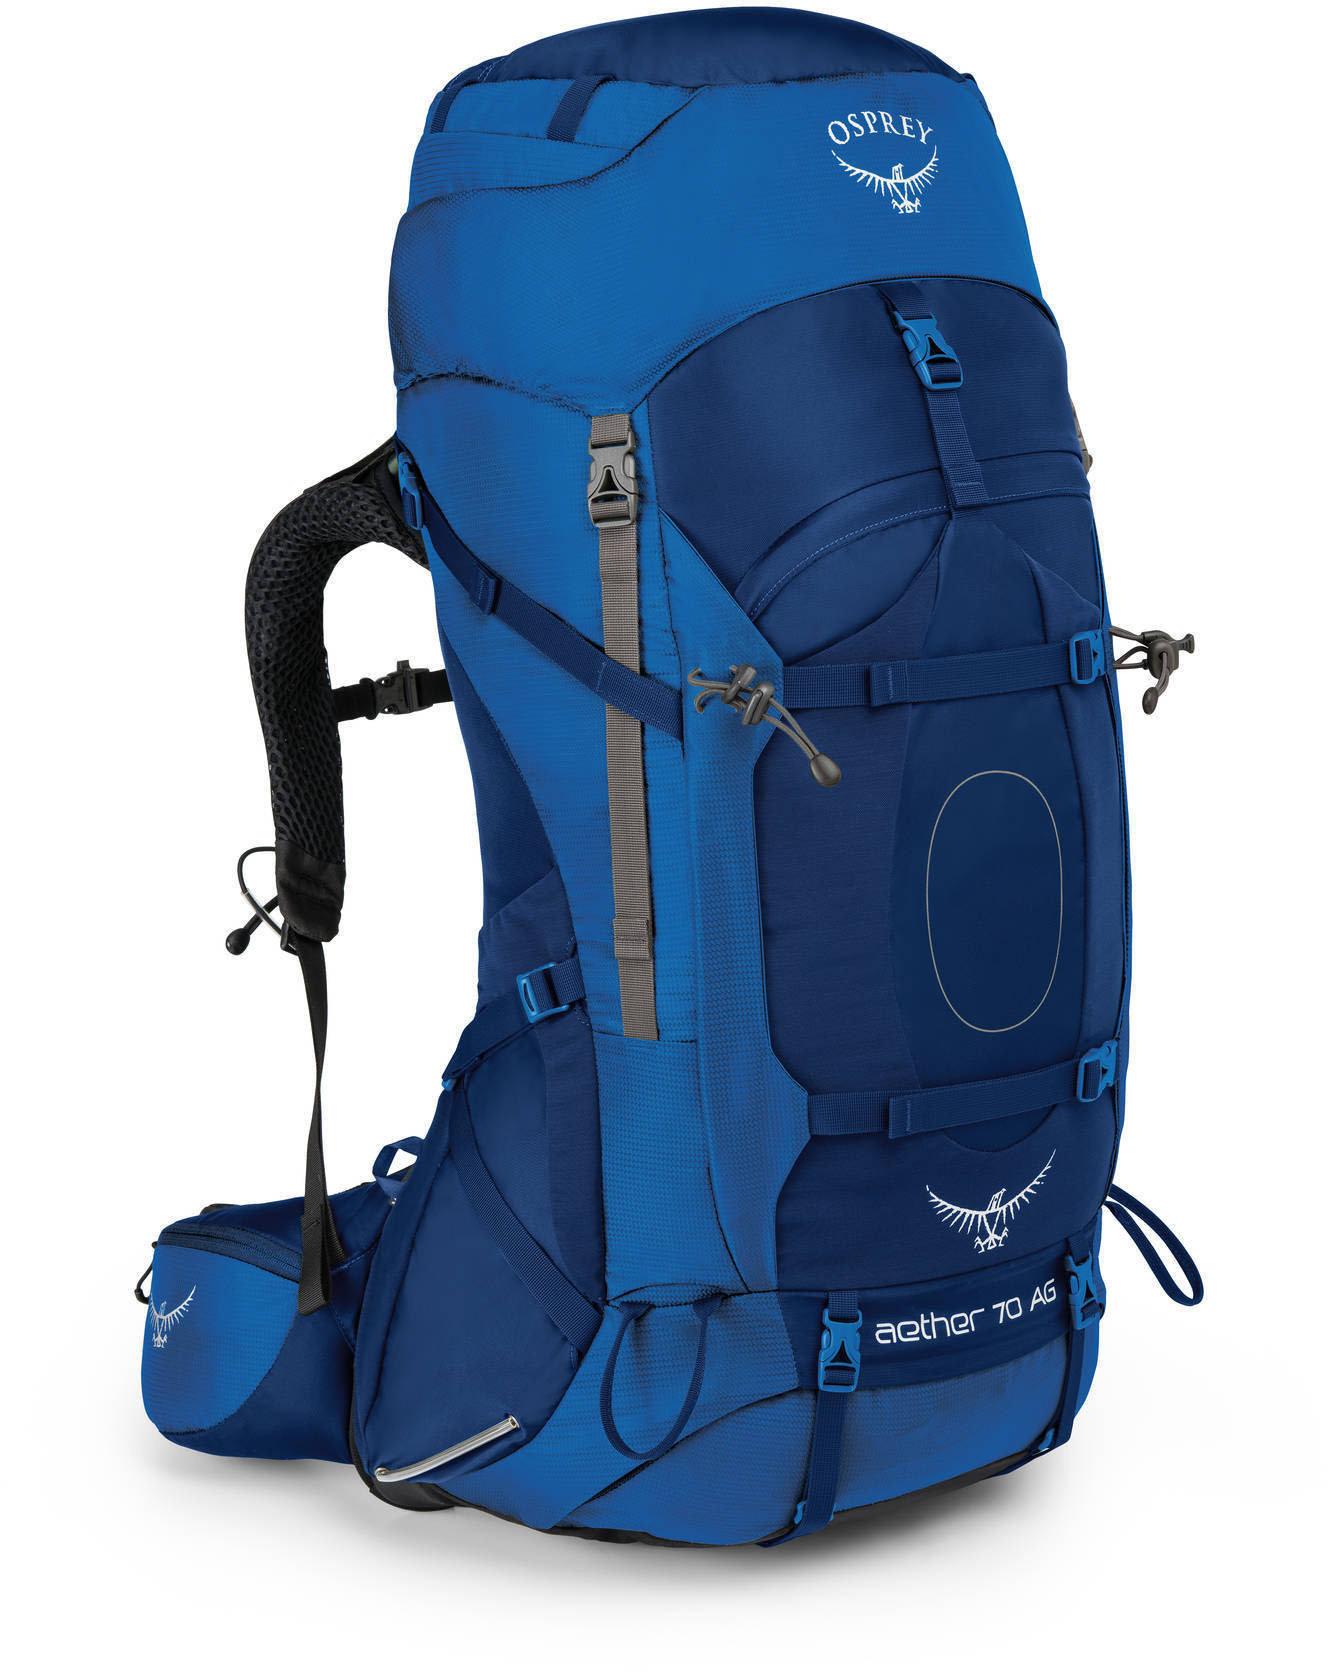 Рюкзак туристический Osprey Aether AG 70 (цвет: Neptune Blue)